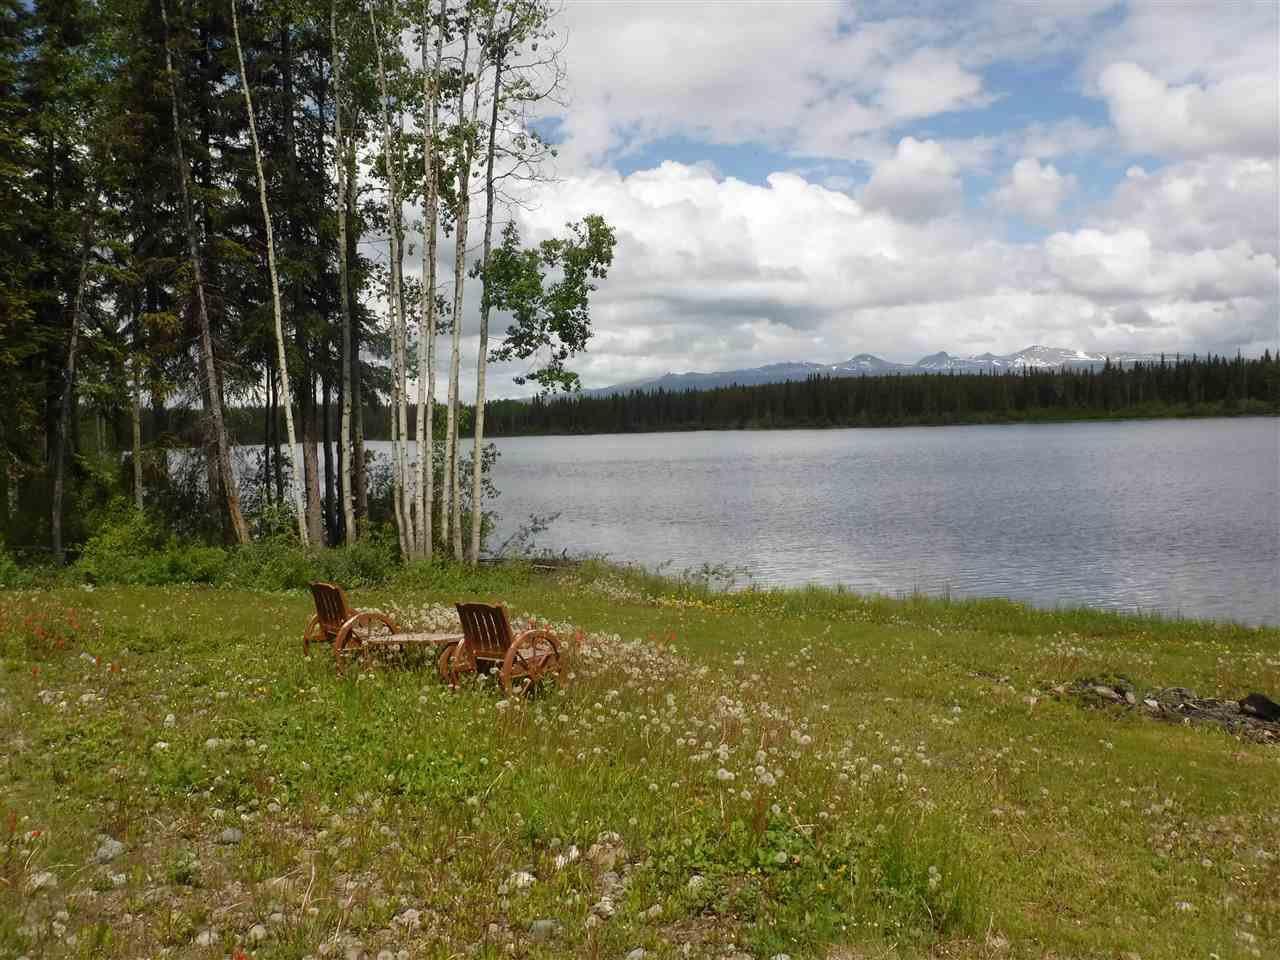 Photo 6: Photos: 3126 ELSEY Road in Williams Lake: Williams Lake - Rural West House for sale (Williams Lake (Zone 27))  : MLS®# R2467730